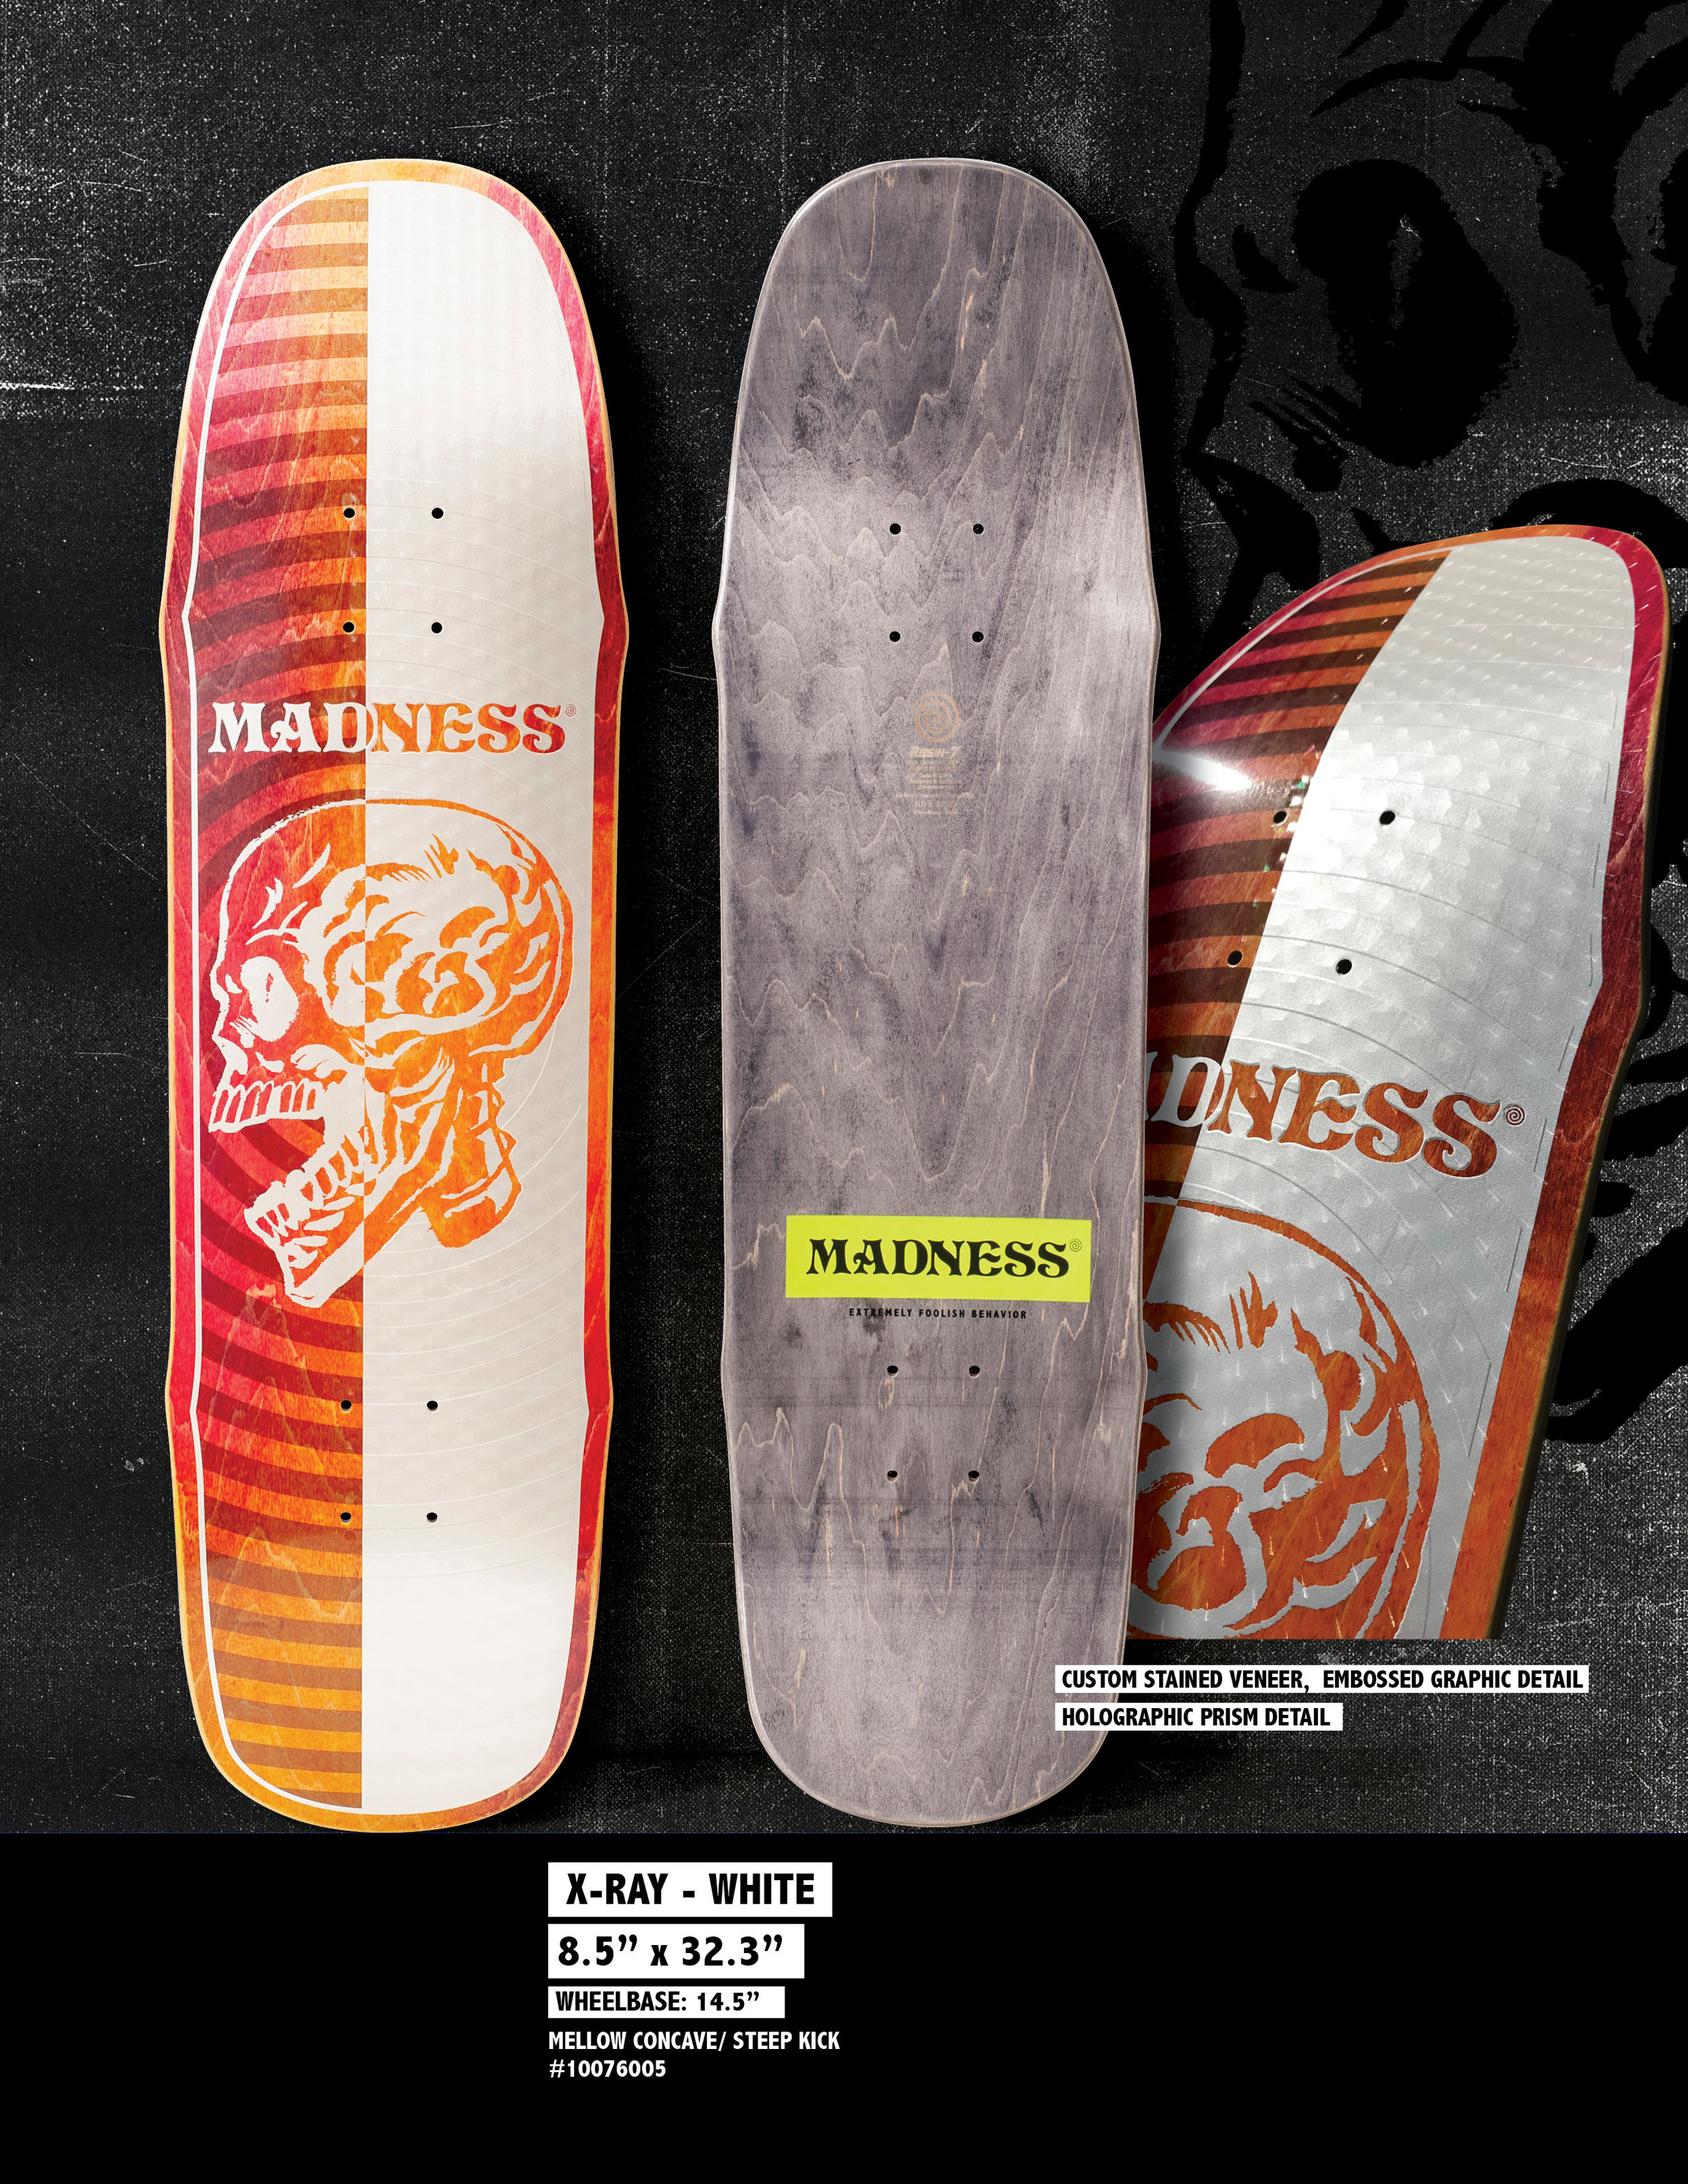 Madness_Spring_1914_x-ray__Skateboard_Deck.jpg